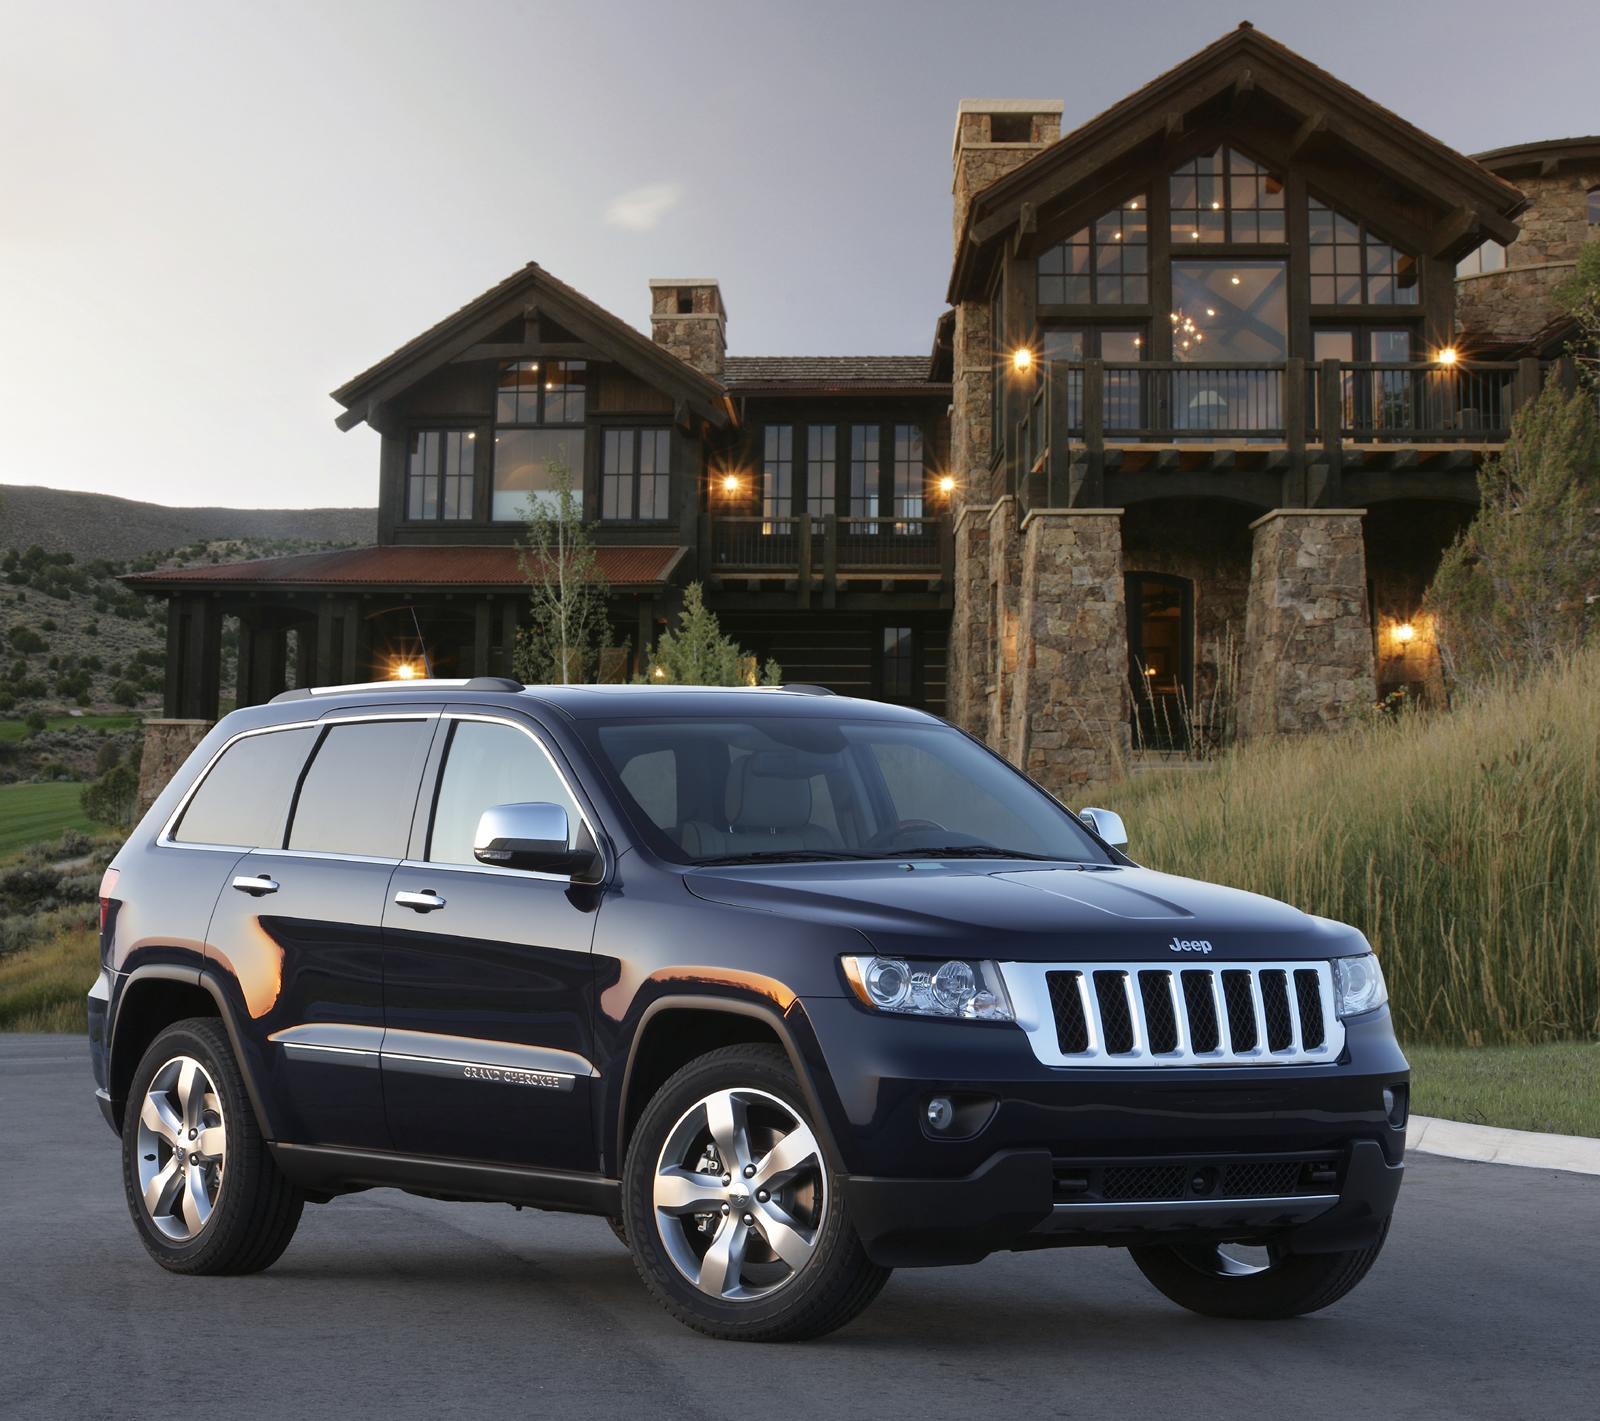 jeep grand cherokee 2011. Black Bedroom Furniture Sets. Home Design Ideas